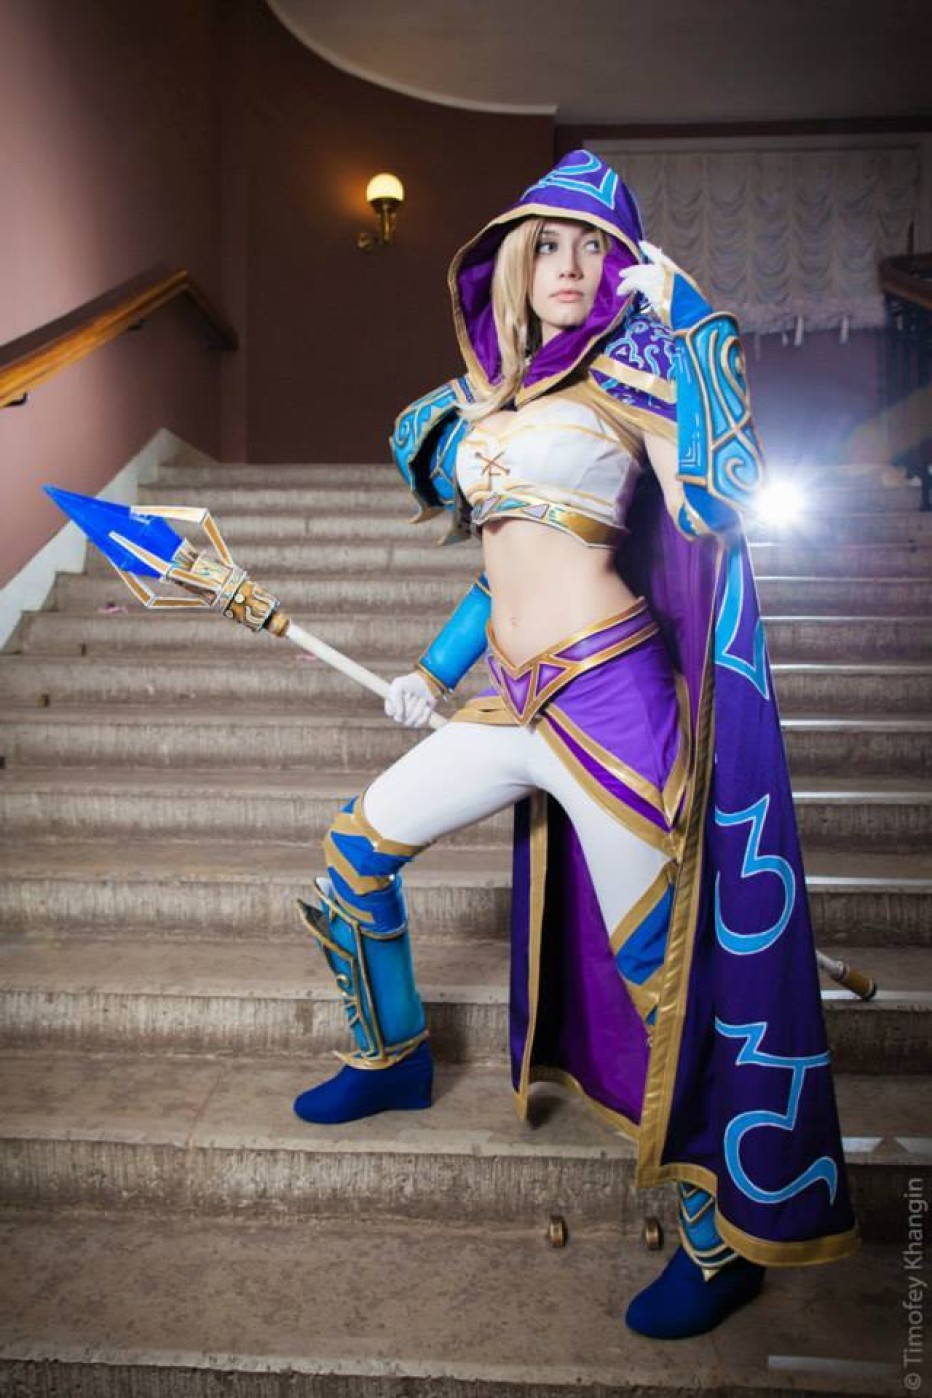 Warcraft-III-Jaina-Proudmoore-Narga-Cosplay-Gamers-Heroes-4.jpg